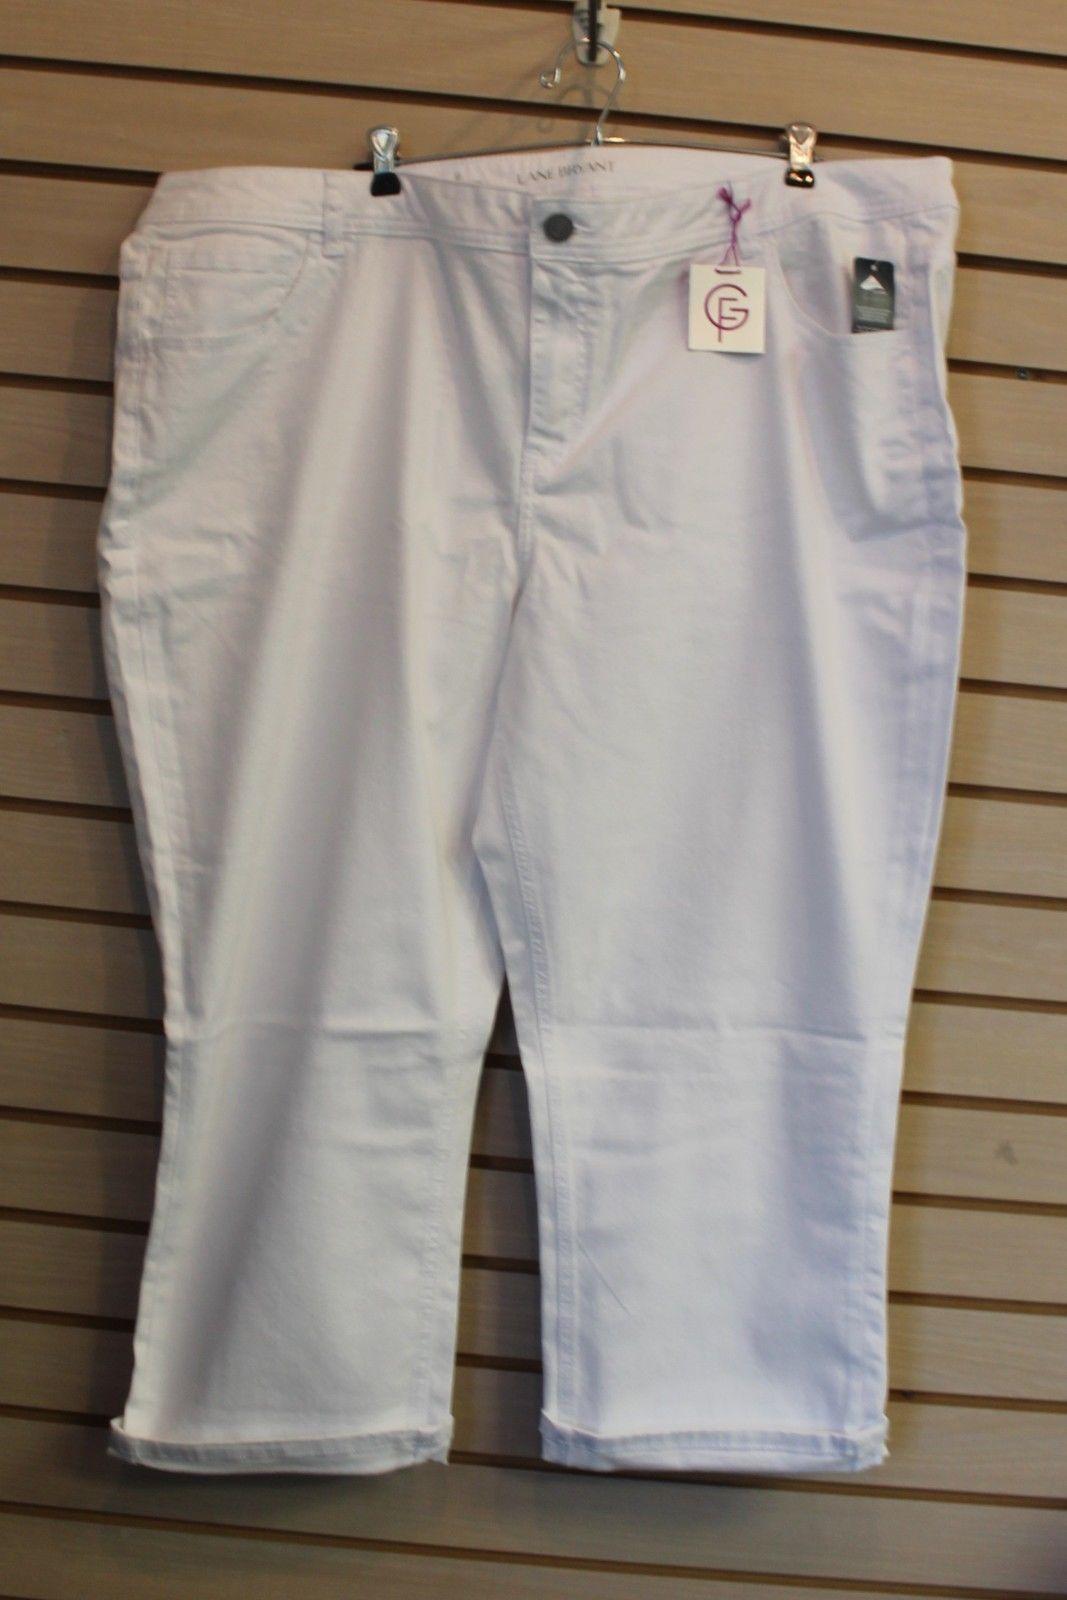 NEW WOMENS LANE BRYANT PLUS SIZE 28W GENIUS FIT WHITE DENIM CROP CAPRI PANTS - $17.41